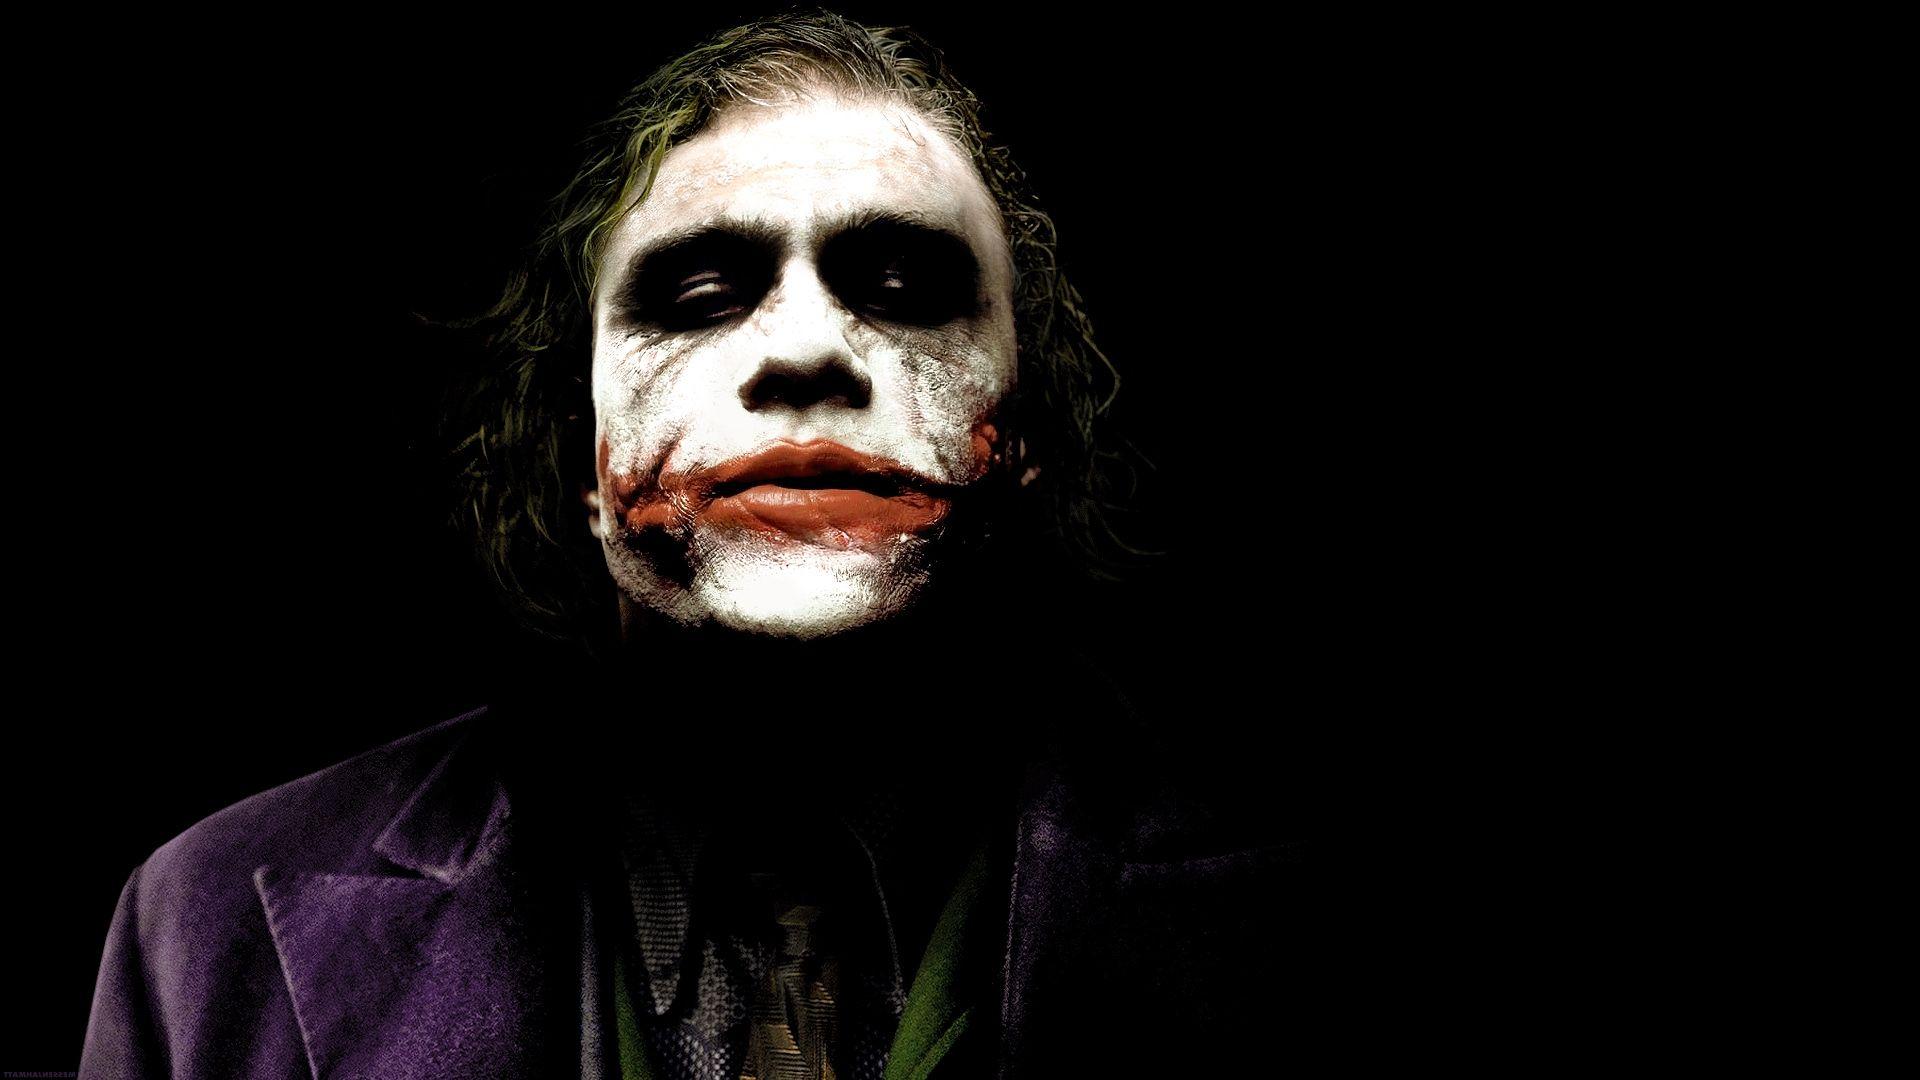 download hd wallpapers of joker – the dark knight movie . free